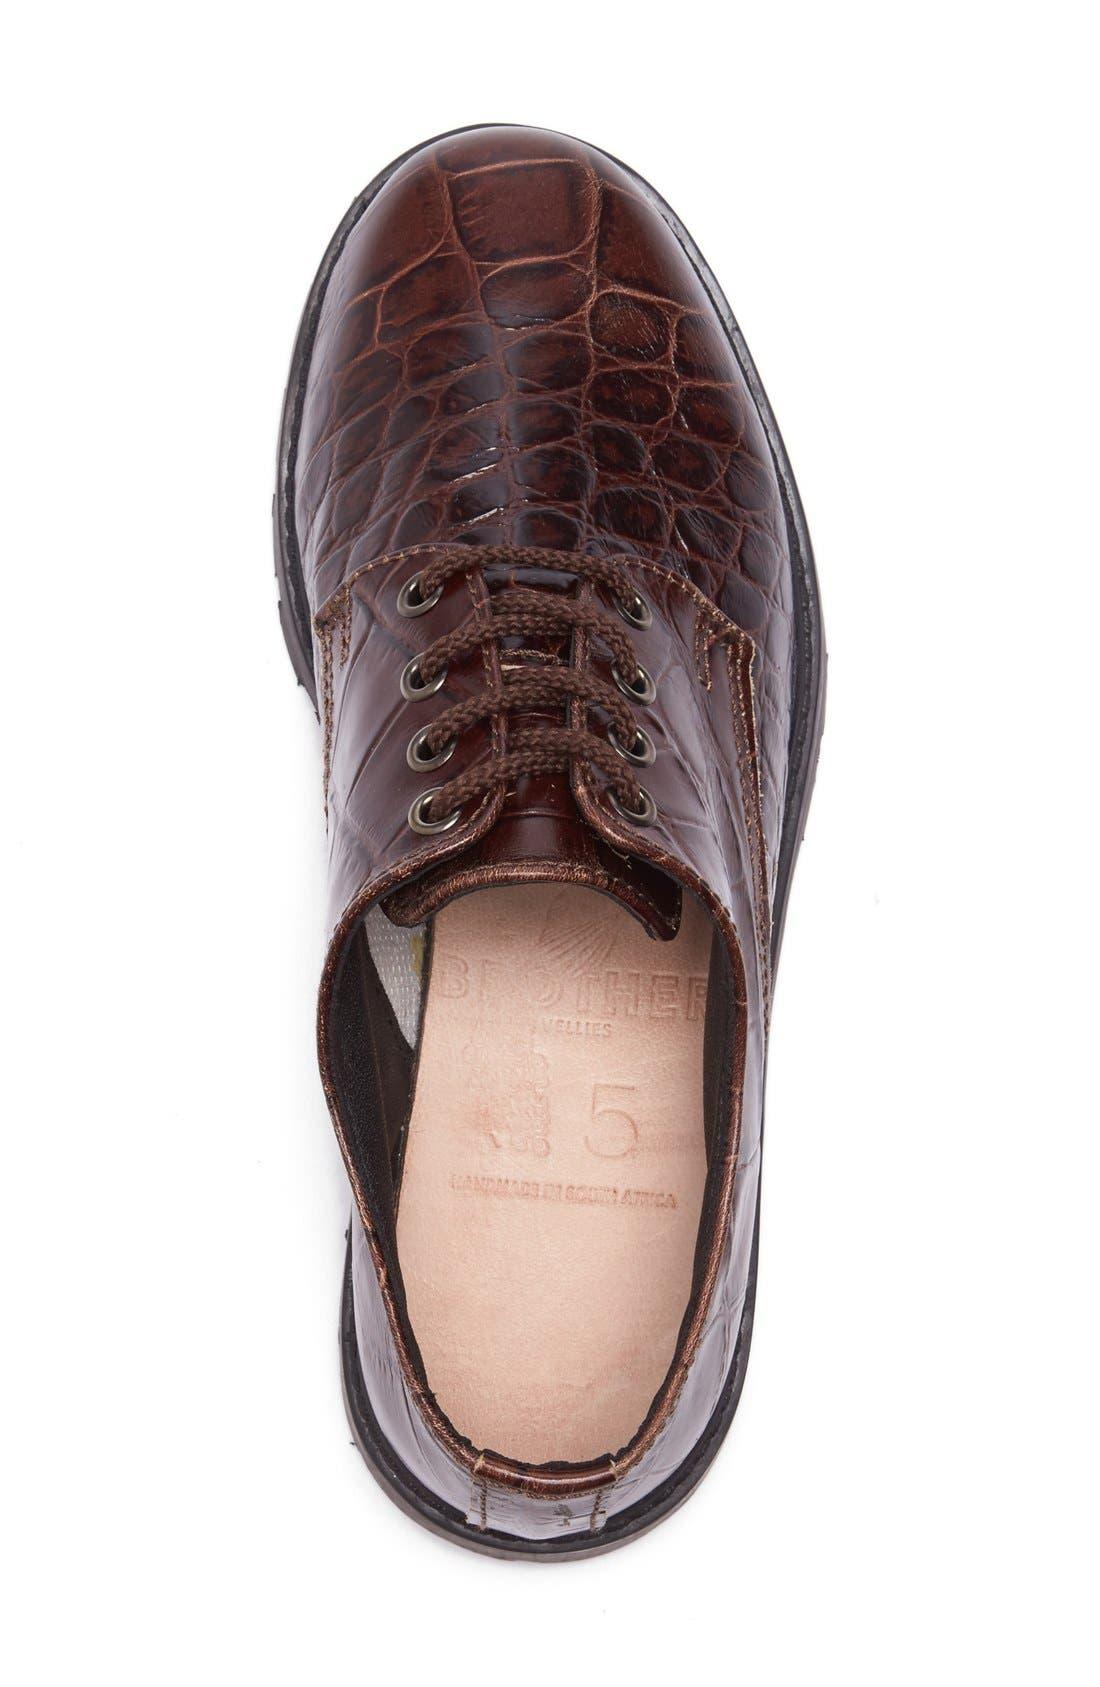 'School Shoe' Lace-Up Oxford,                             Alternate thumbnail 2, color,                             210